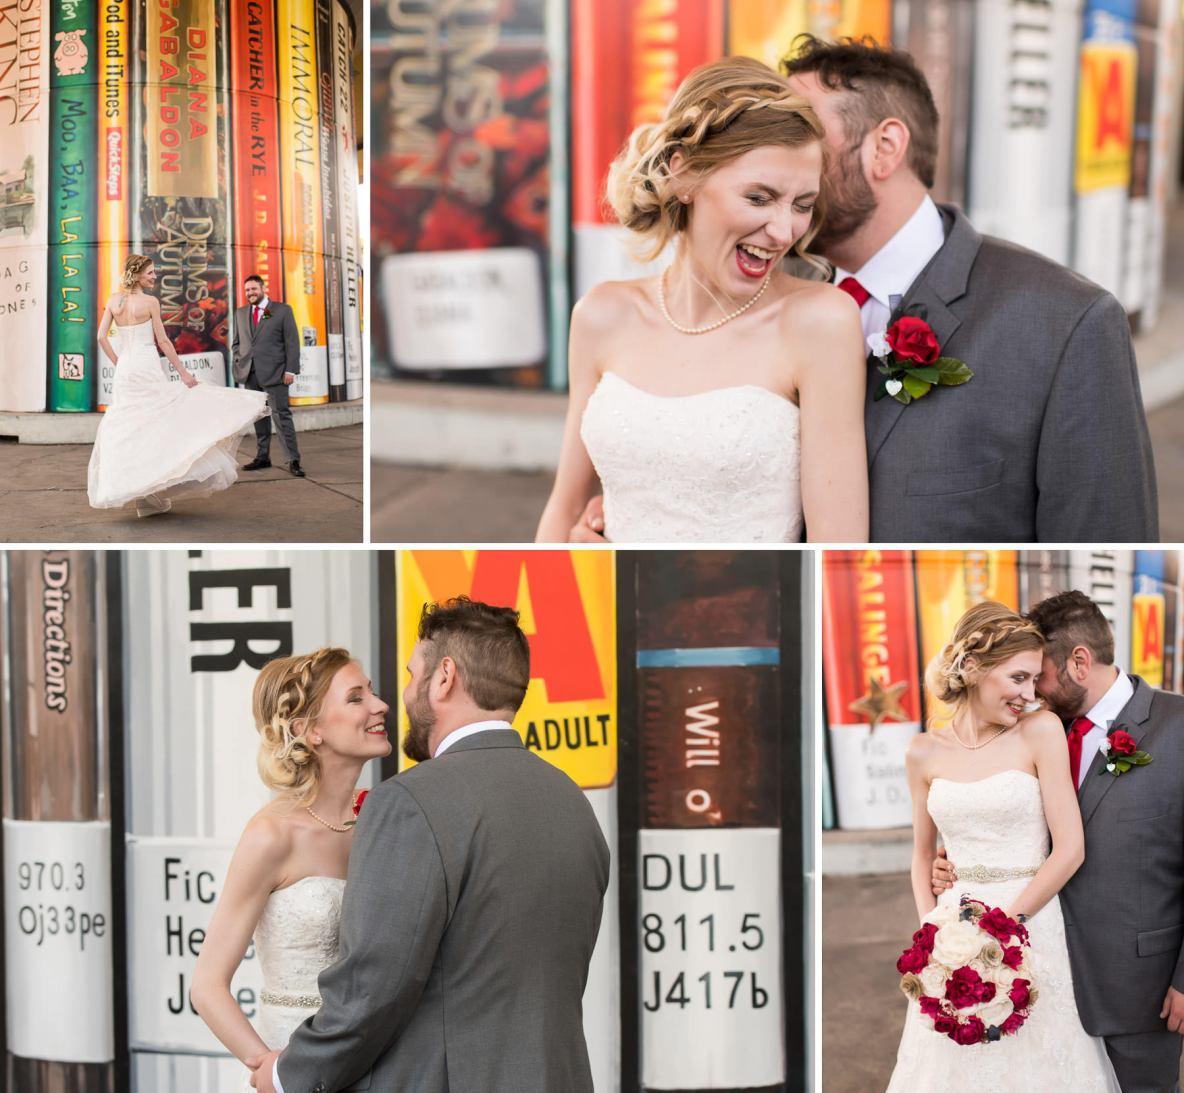 Lex and Maddie's wedding pics.